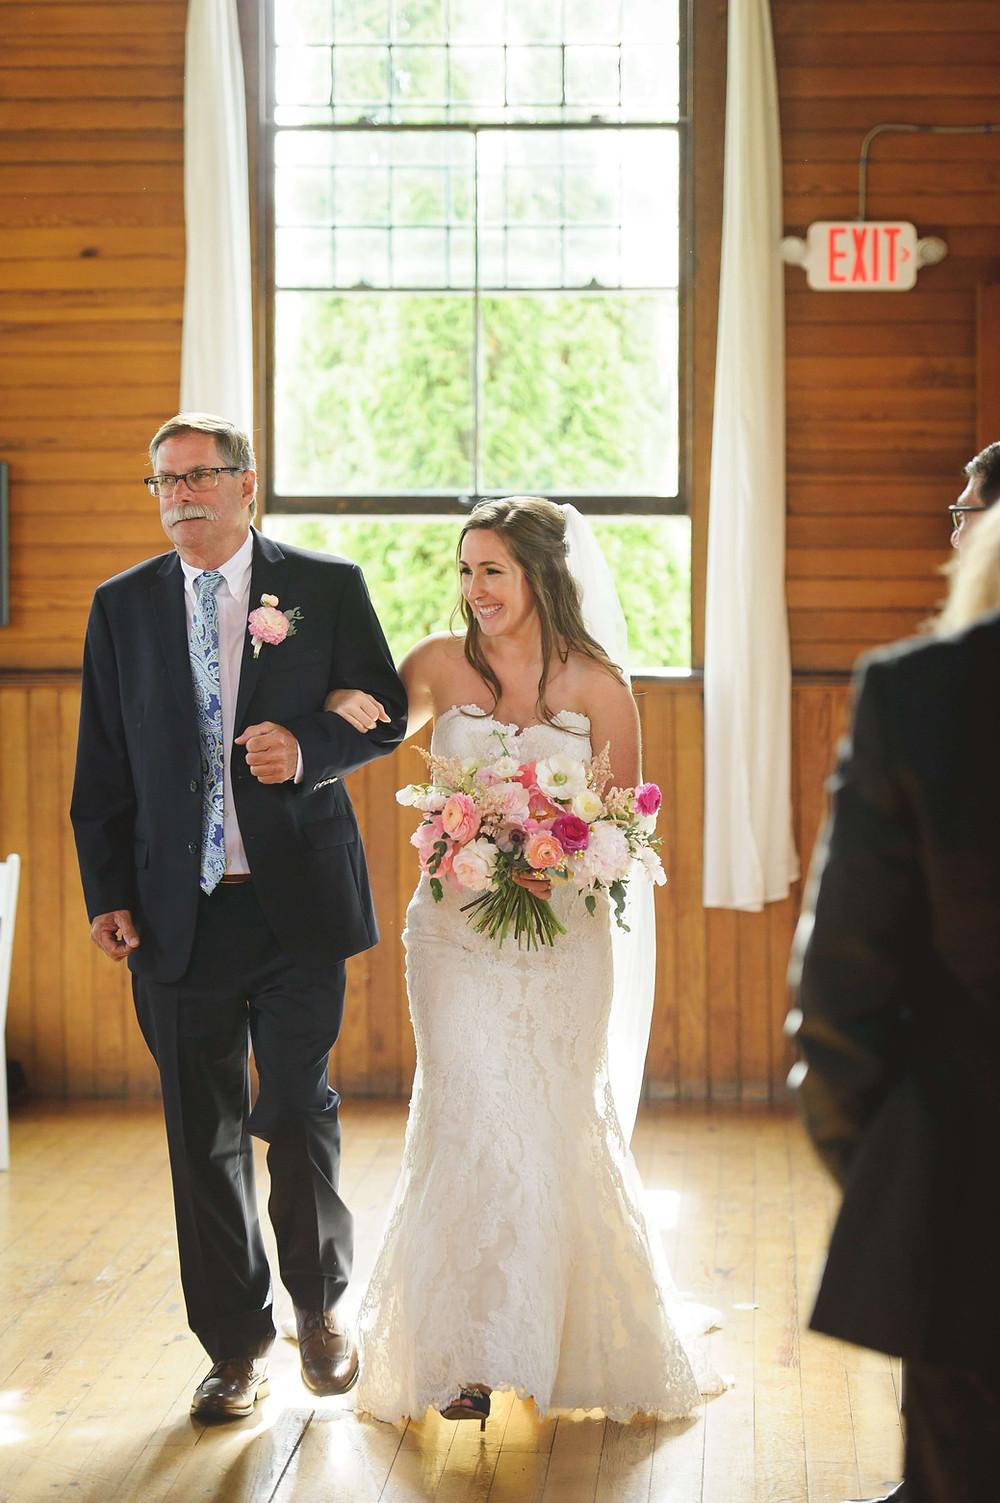 Wedding ceremony in Branford chapel